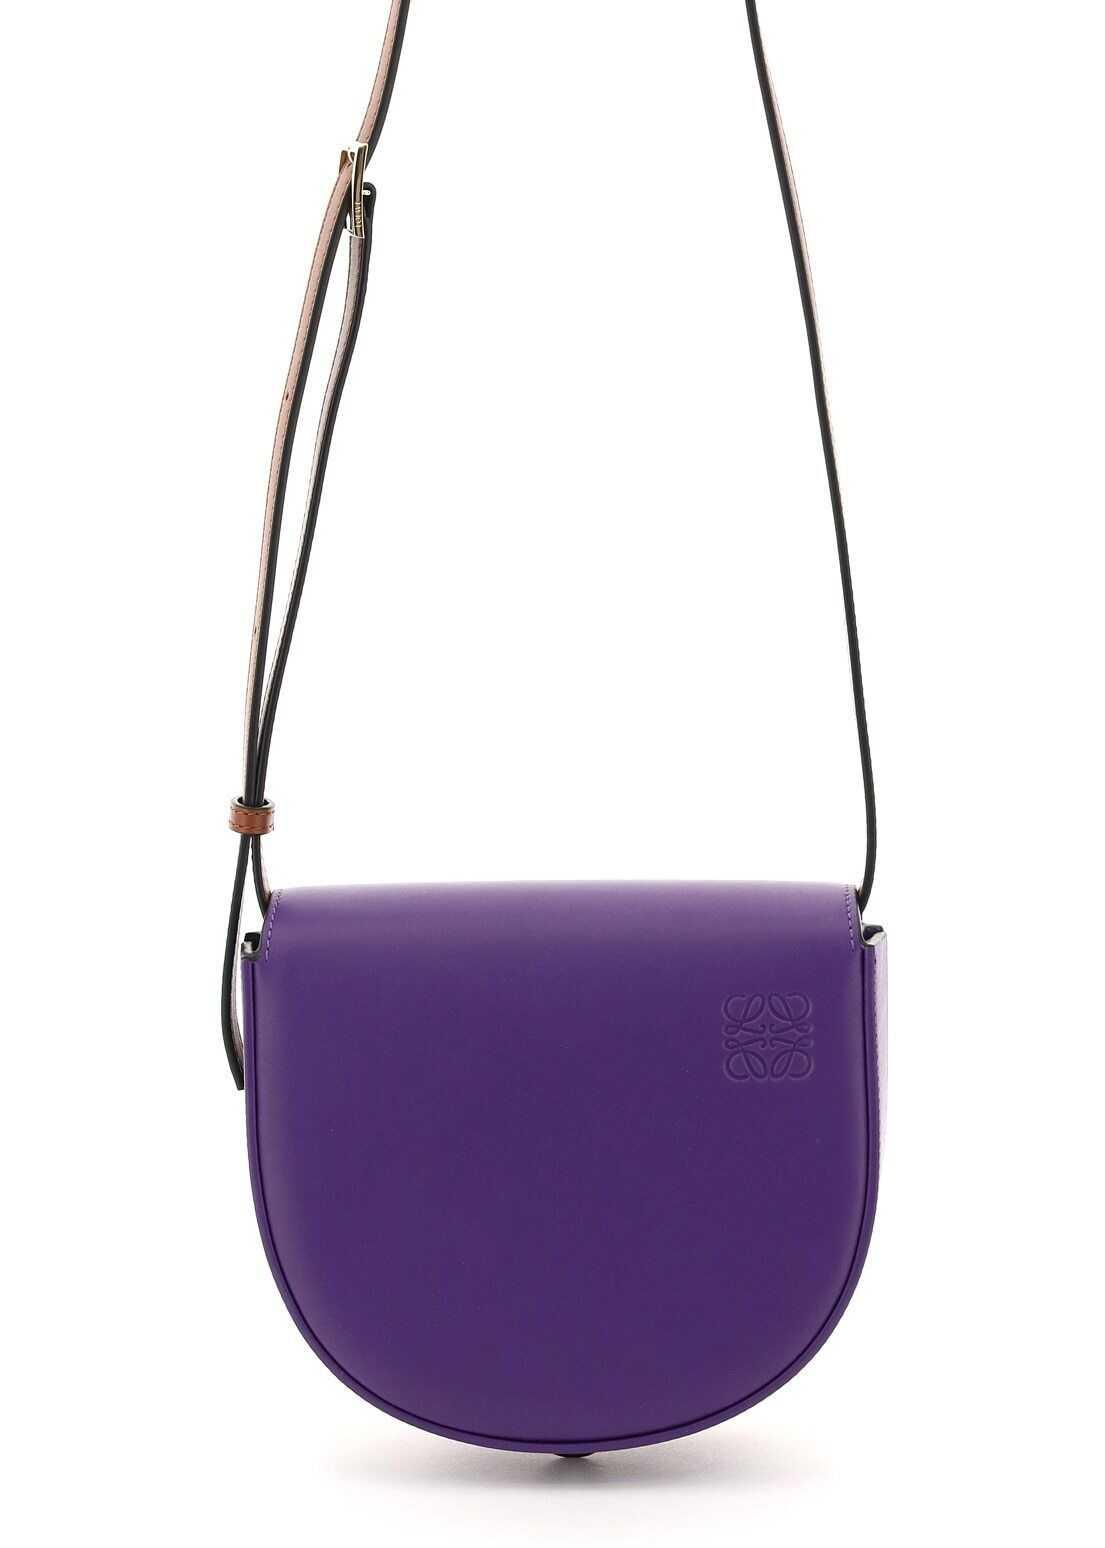 Loewe Heel Duo Mini Shoulder Bag A894A01X02 PURPLE COGNAC imagine b-mall.ro